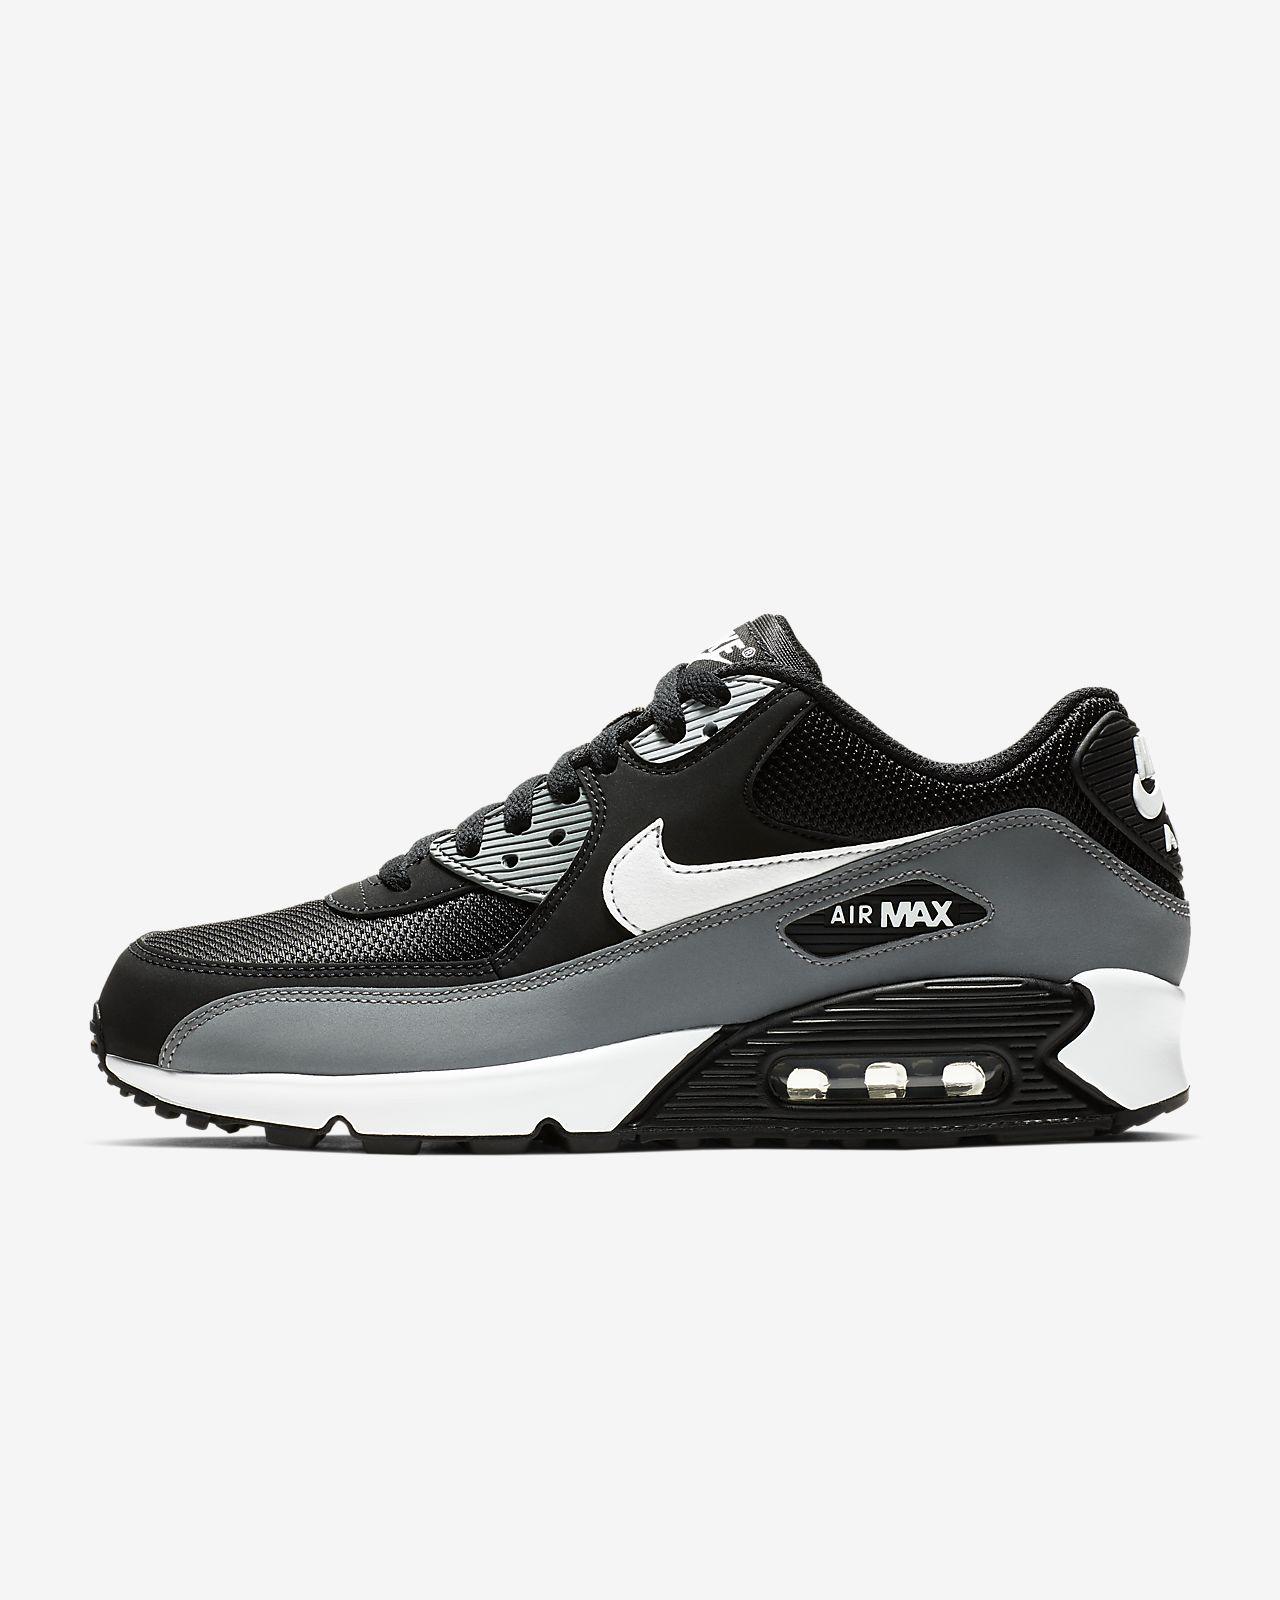 buy online 2084e d3d86 ... Scarpa Nike Air Max 90 Essential - Uomo